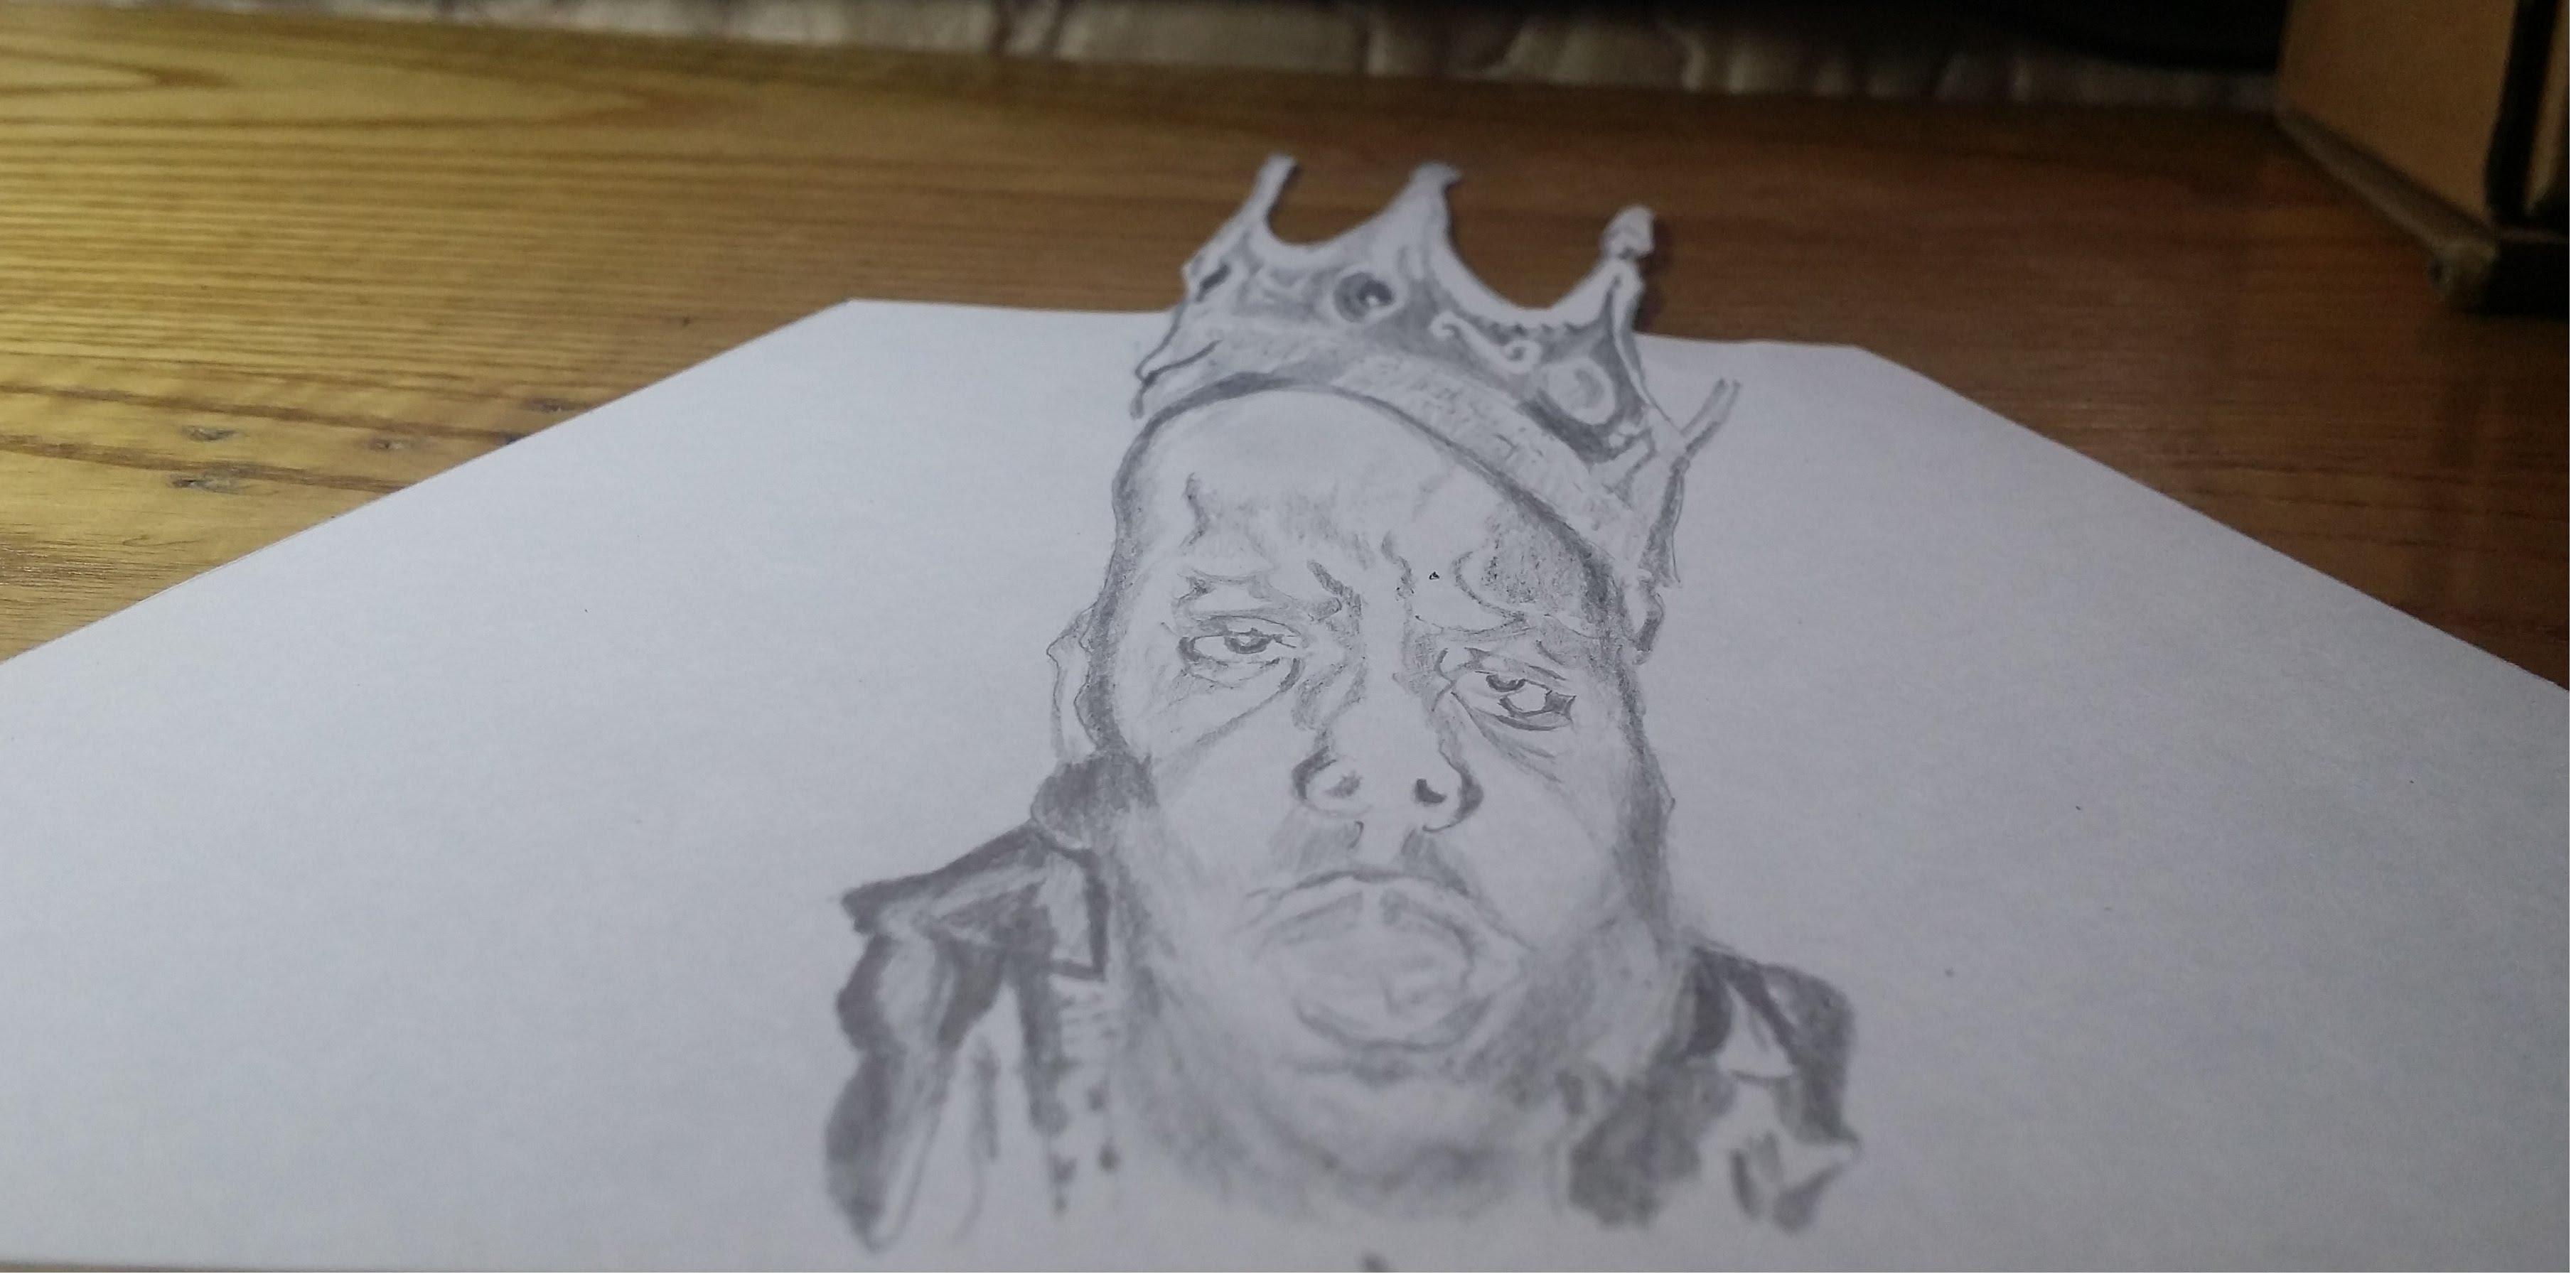 3624x1800 The Notorious B.i.g. 3d Drawing Biggie Smalls